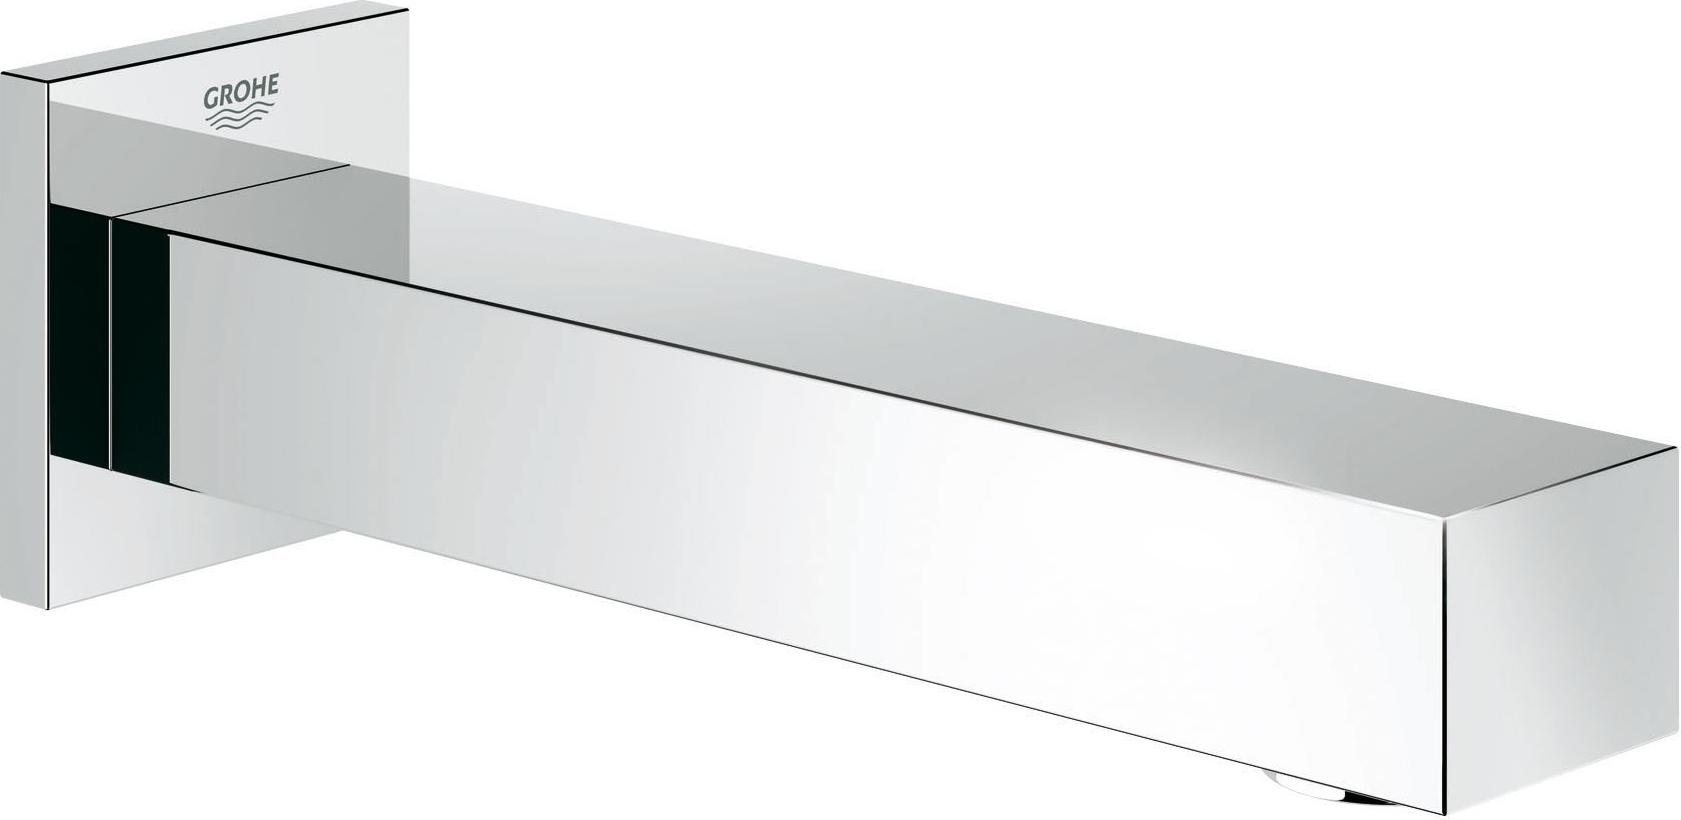 Излив для ванны Grohe Universal Cube (13303000)